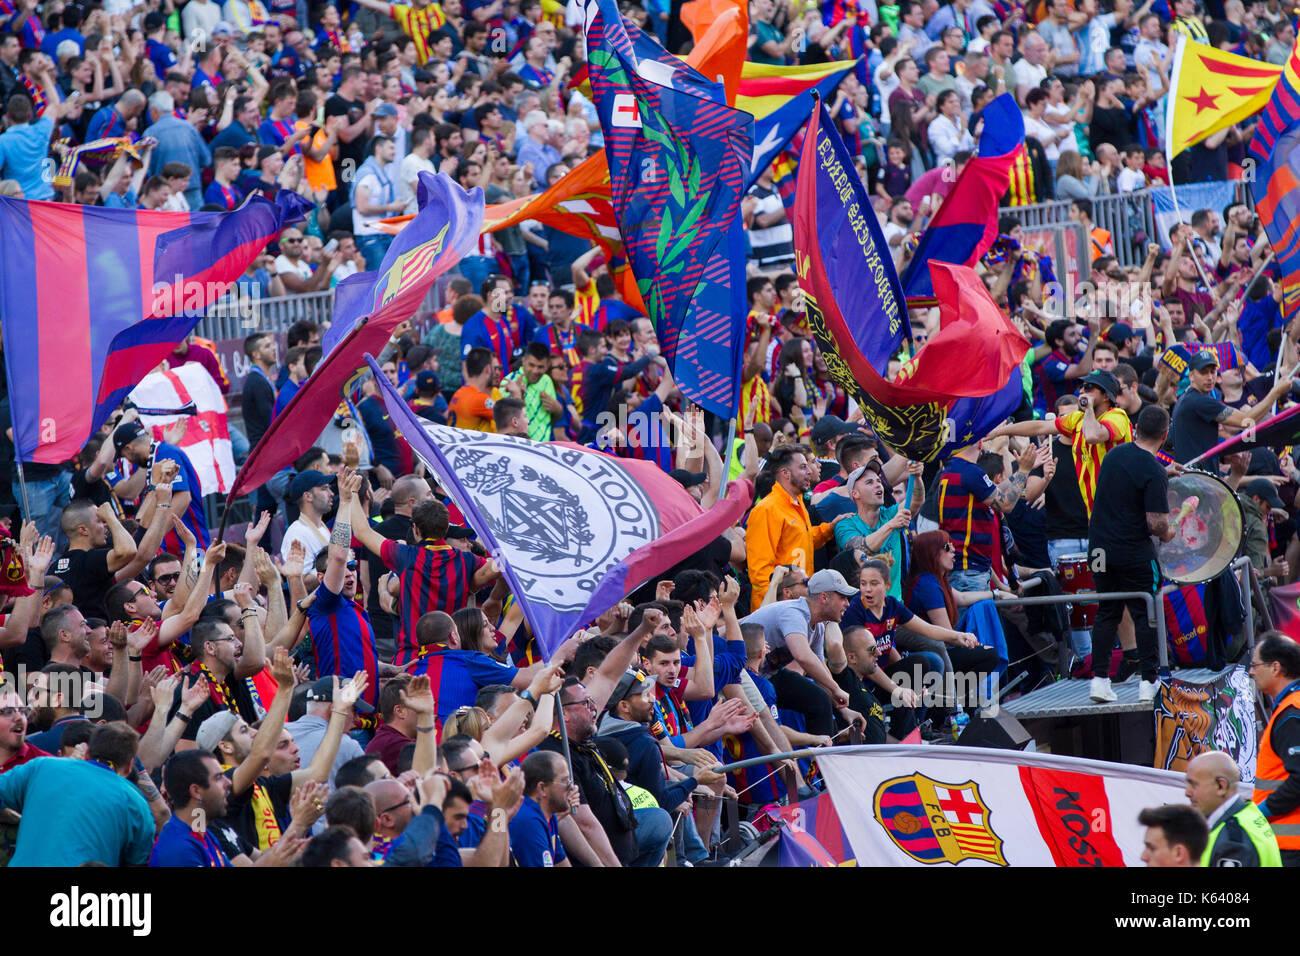 Barcelona fans and supporters celebrating goal scored - 6/5/17 Barcelona v Villarreal football league match at the Camp Nou stadium, Barcelona. - Stock Image